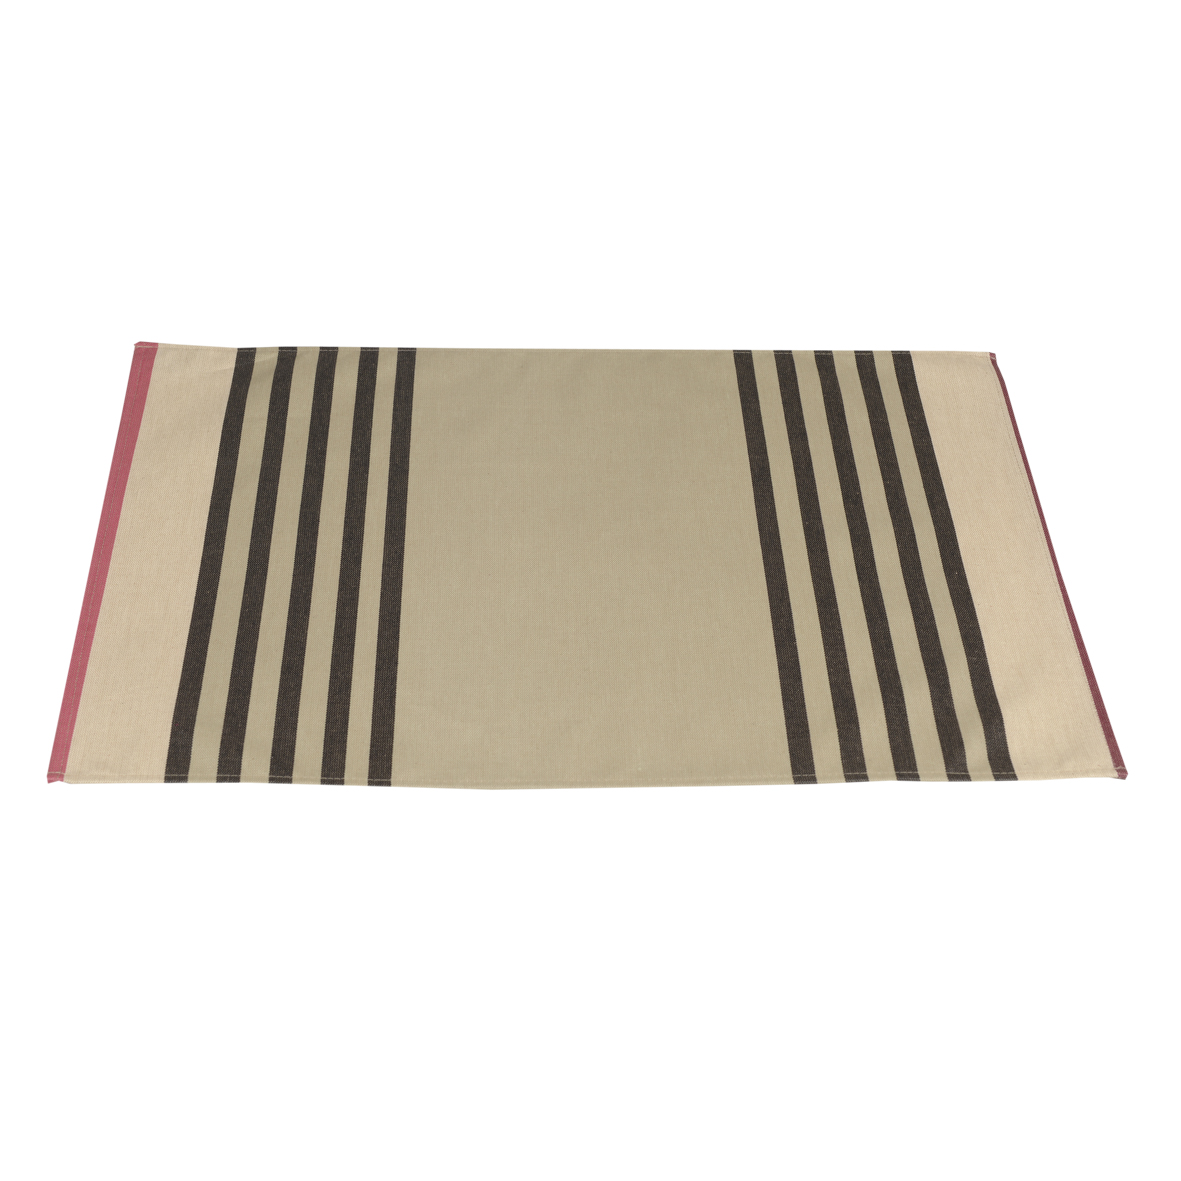 set-de-table-enduit-larrau_TOENSETOS2-0741-1